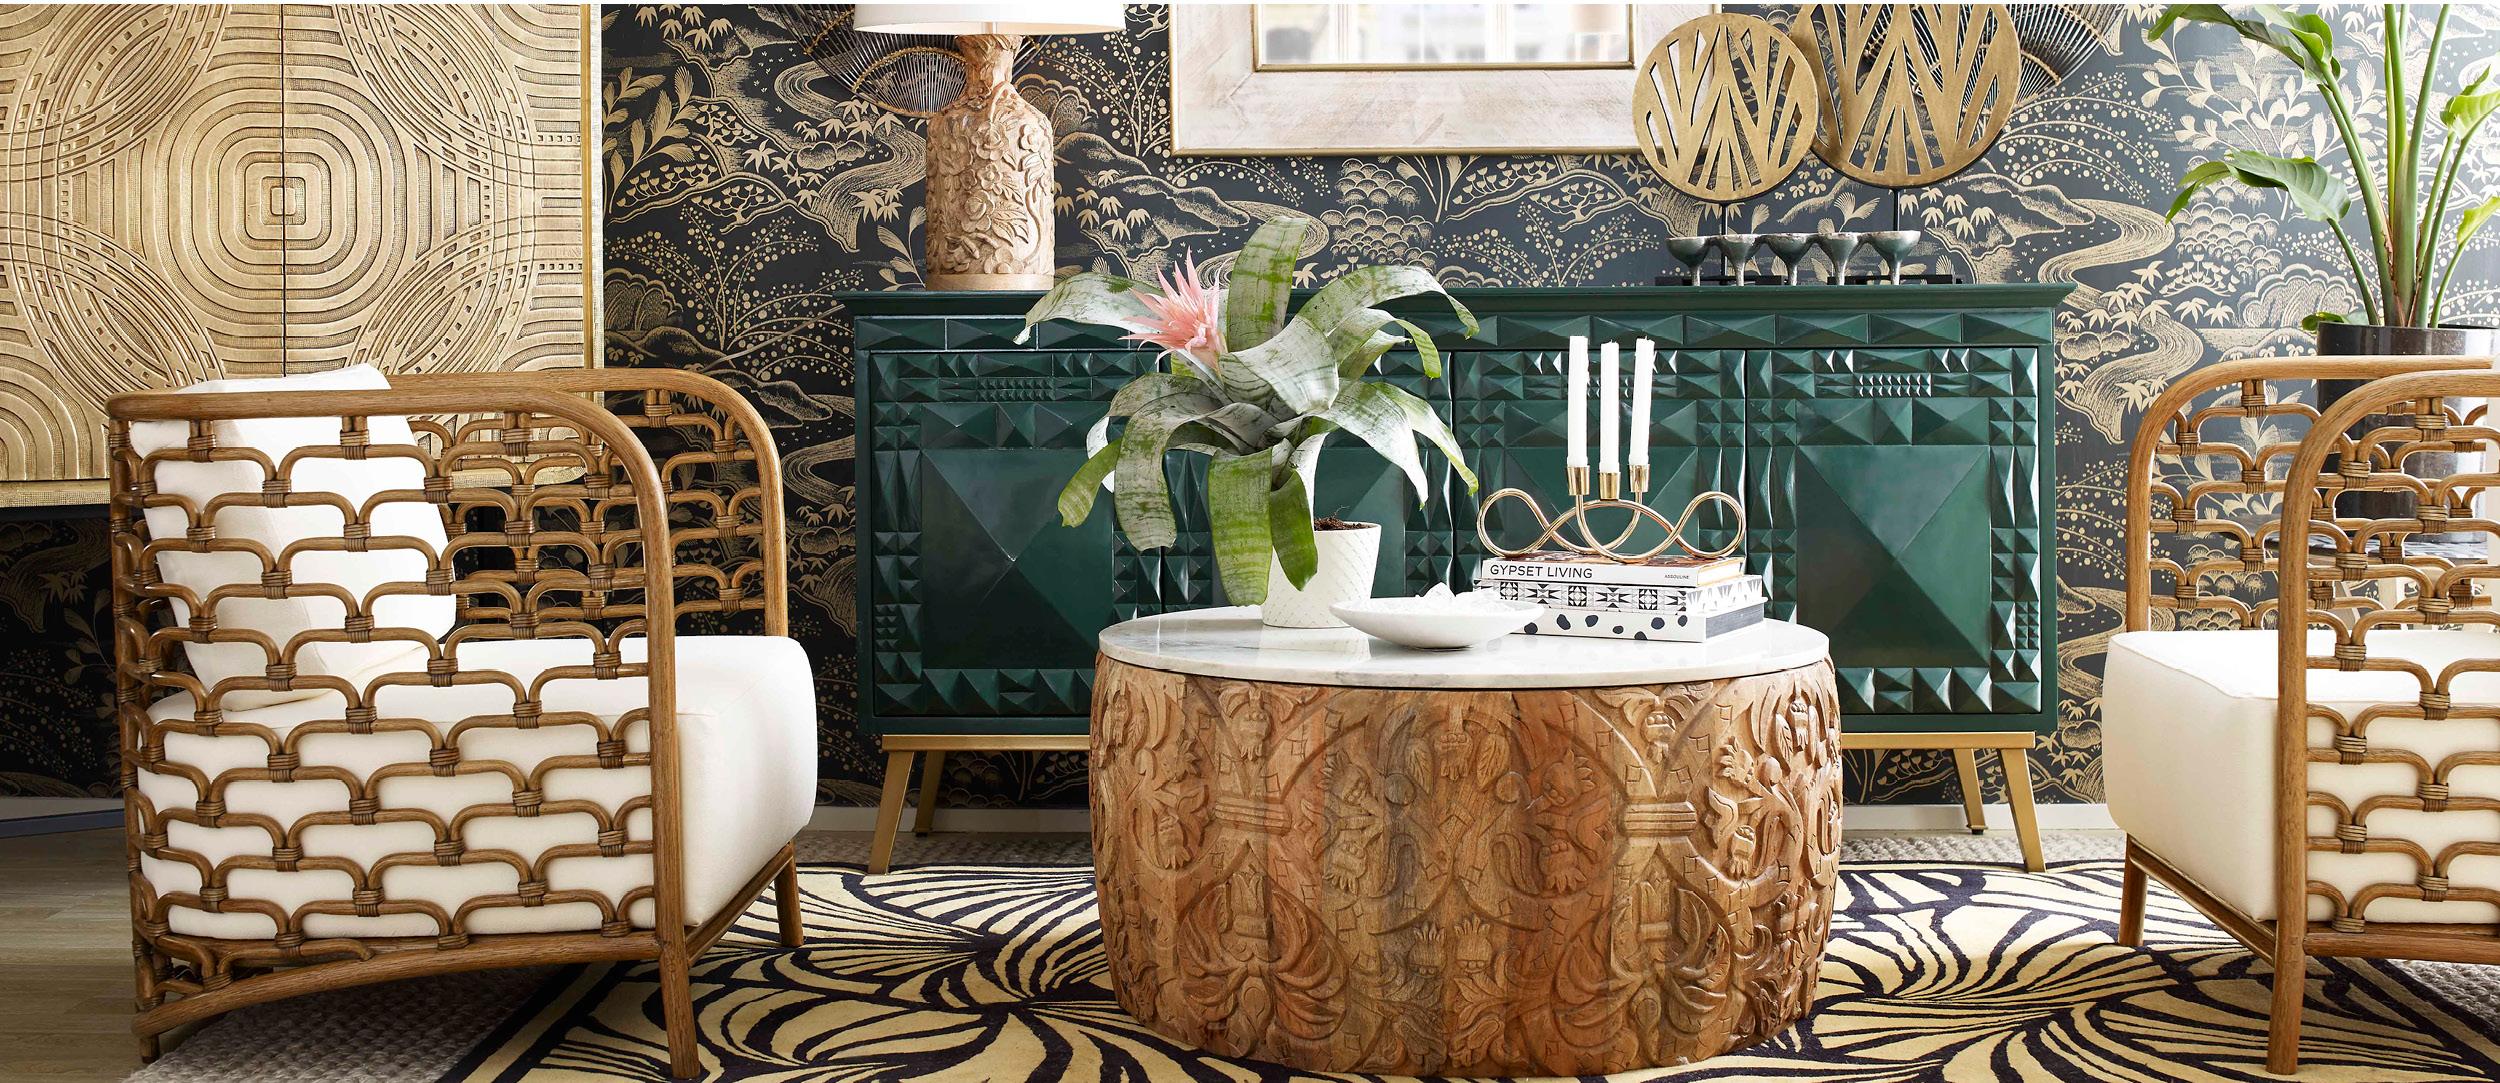 Selamat Designs X Morris & Co.  -